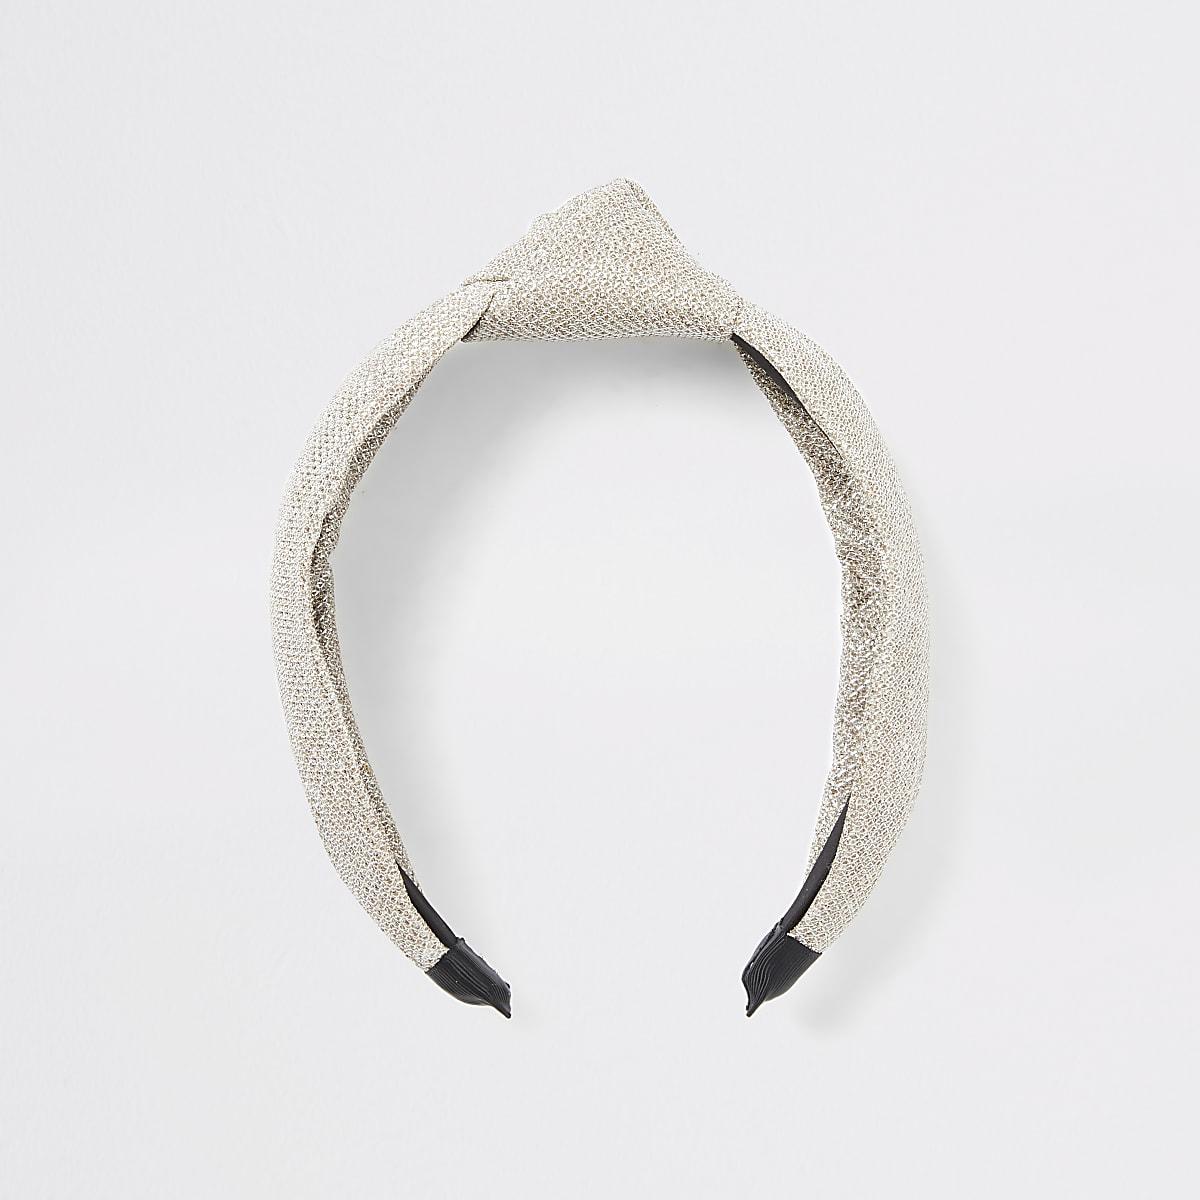 Goudkleurige metallic haarband met knoop en textuur